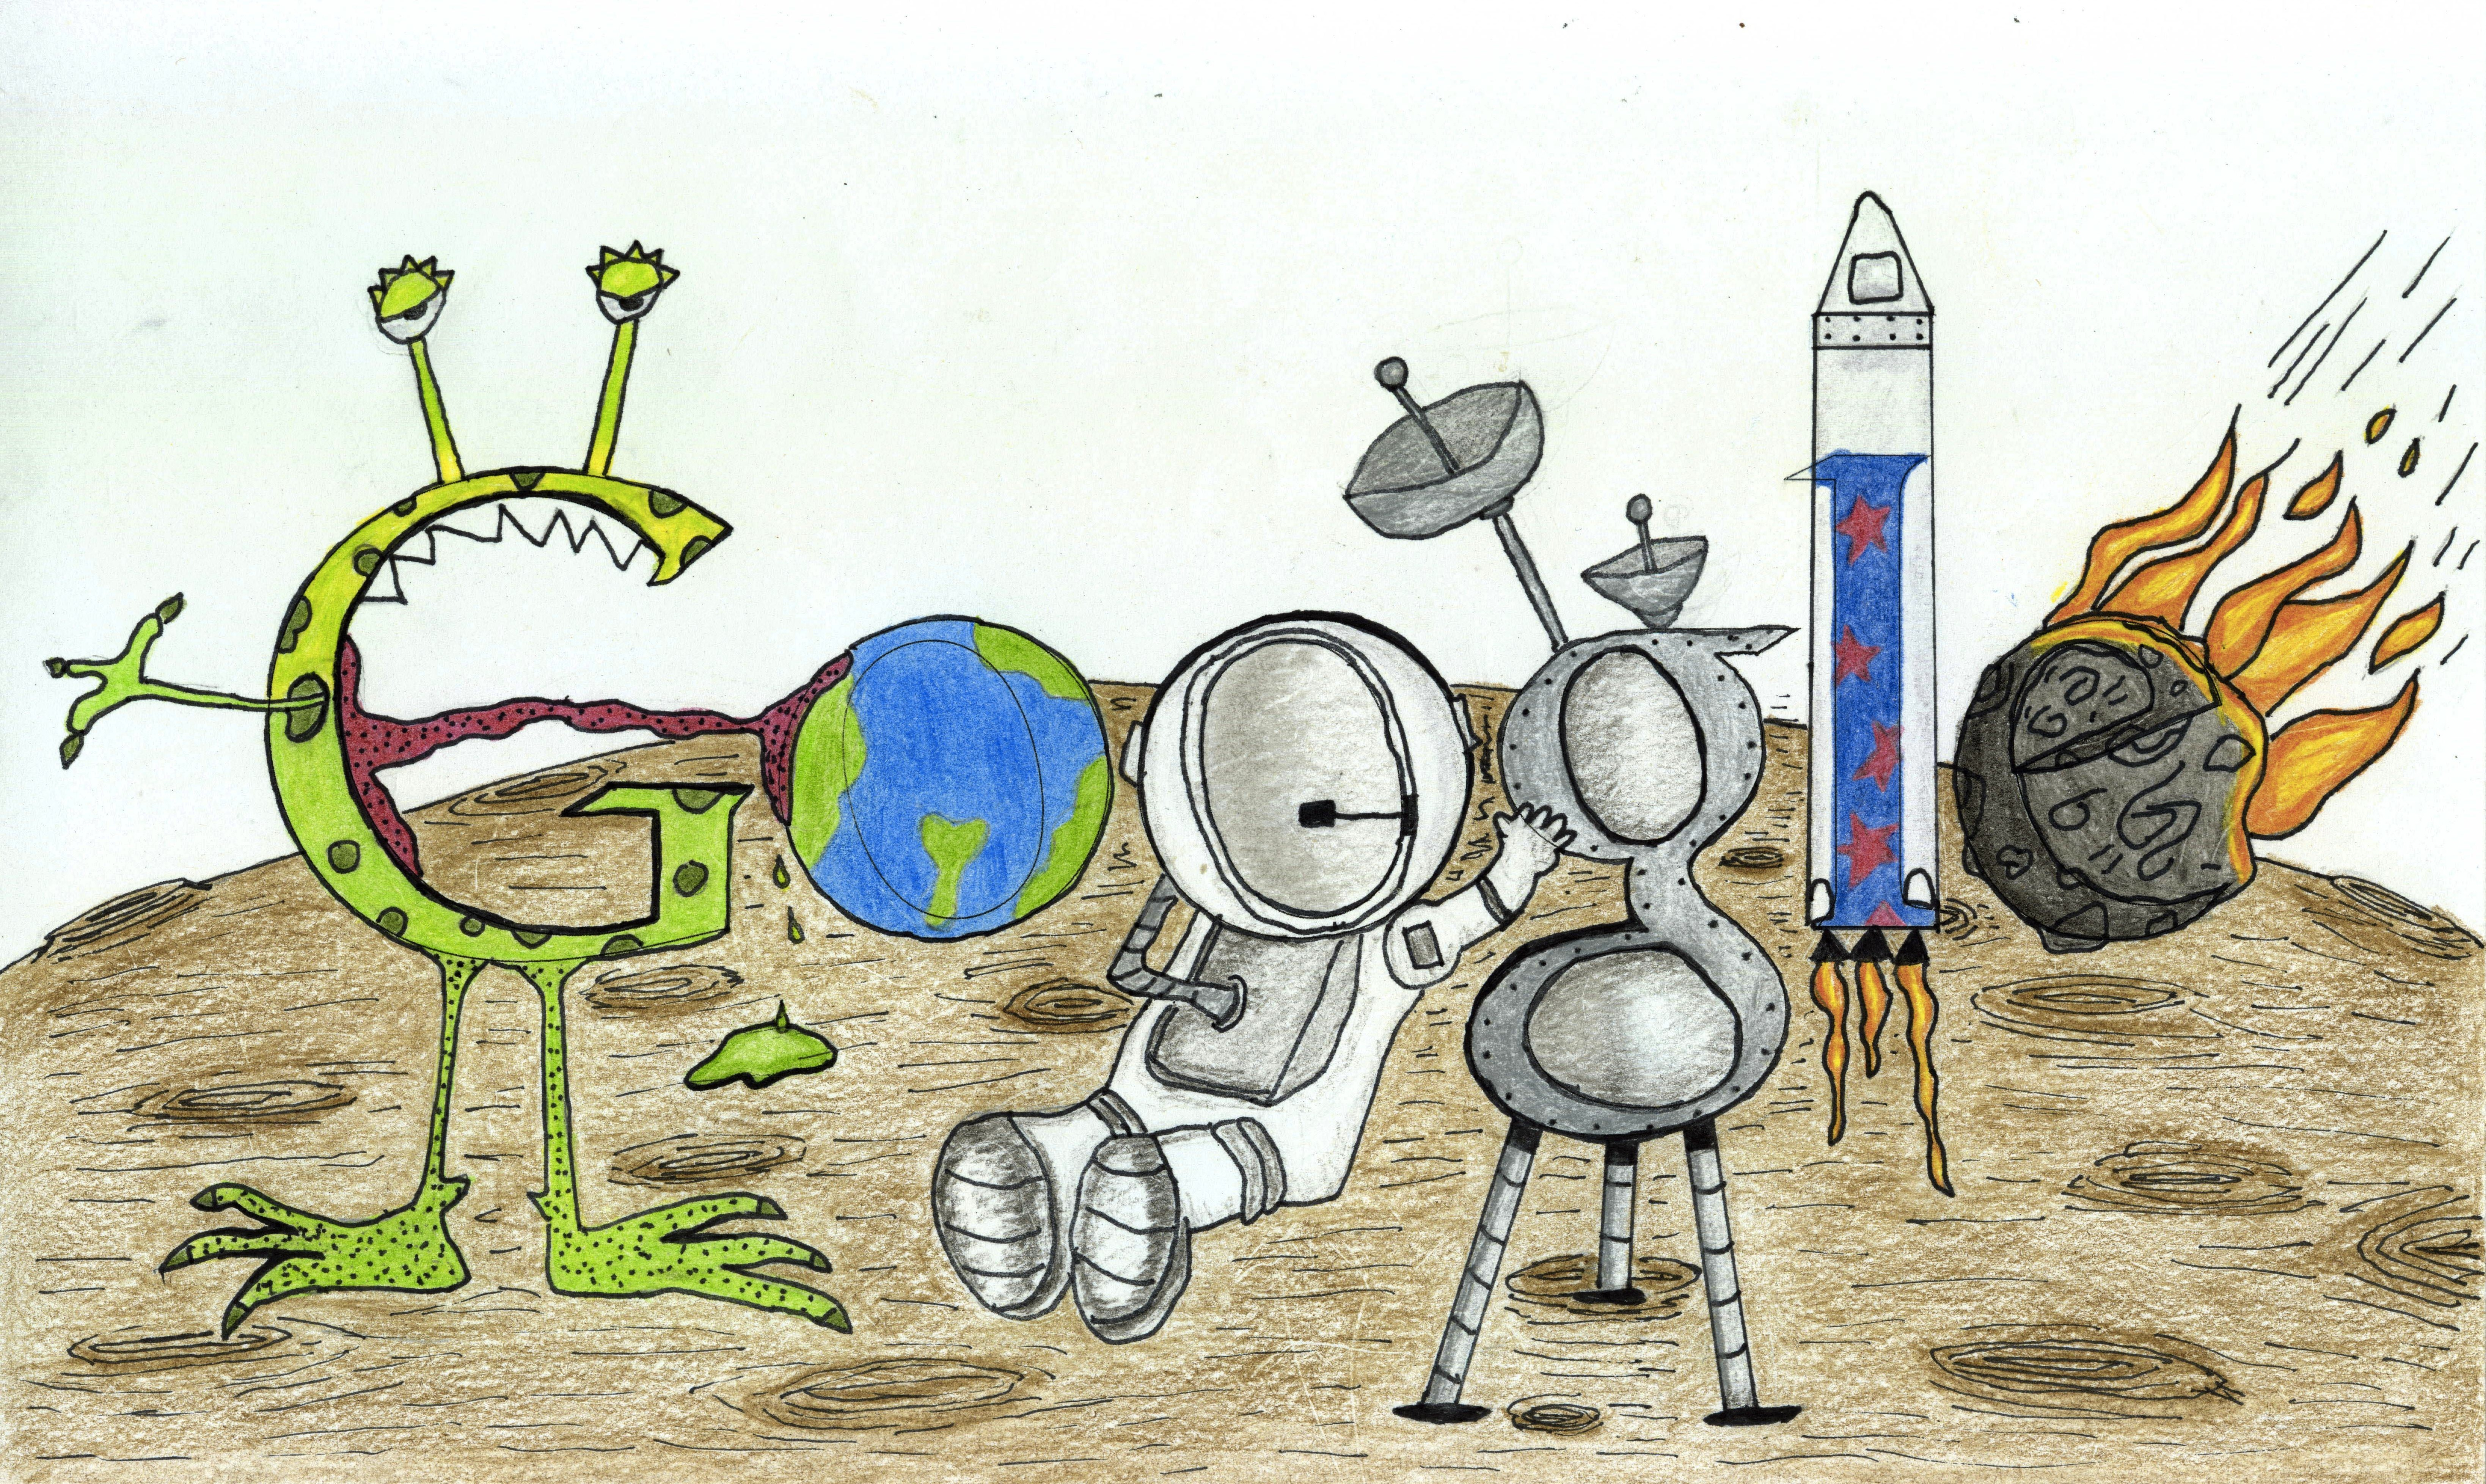 Doodle 4 Google winner: Matteo Lopez, 7